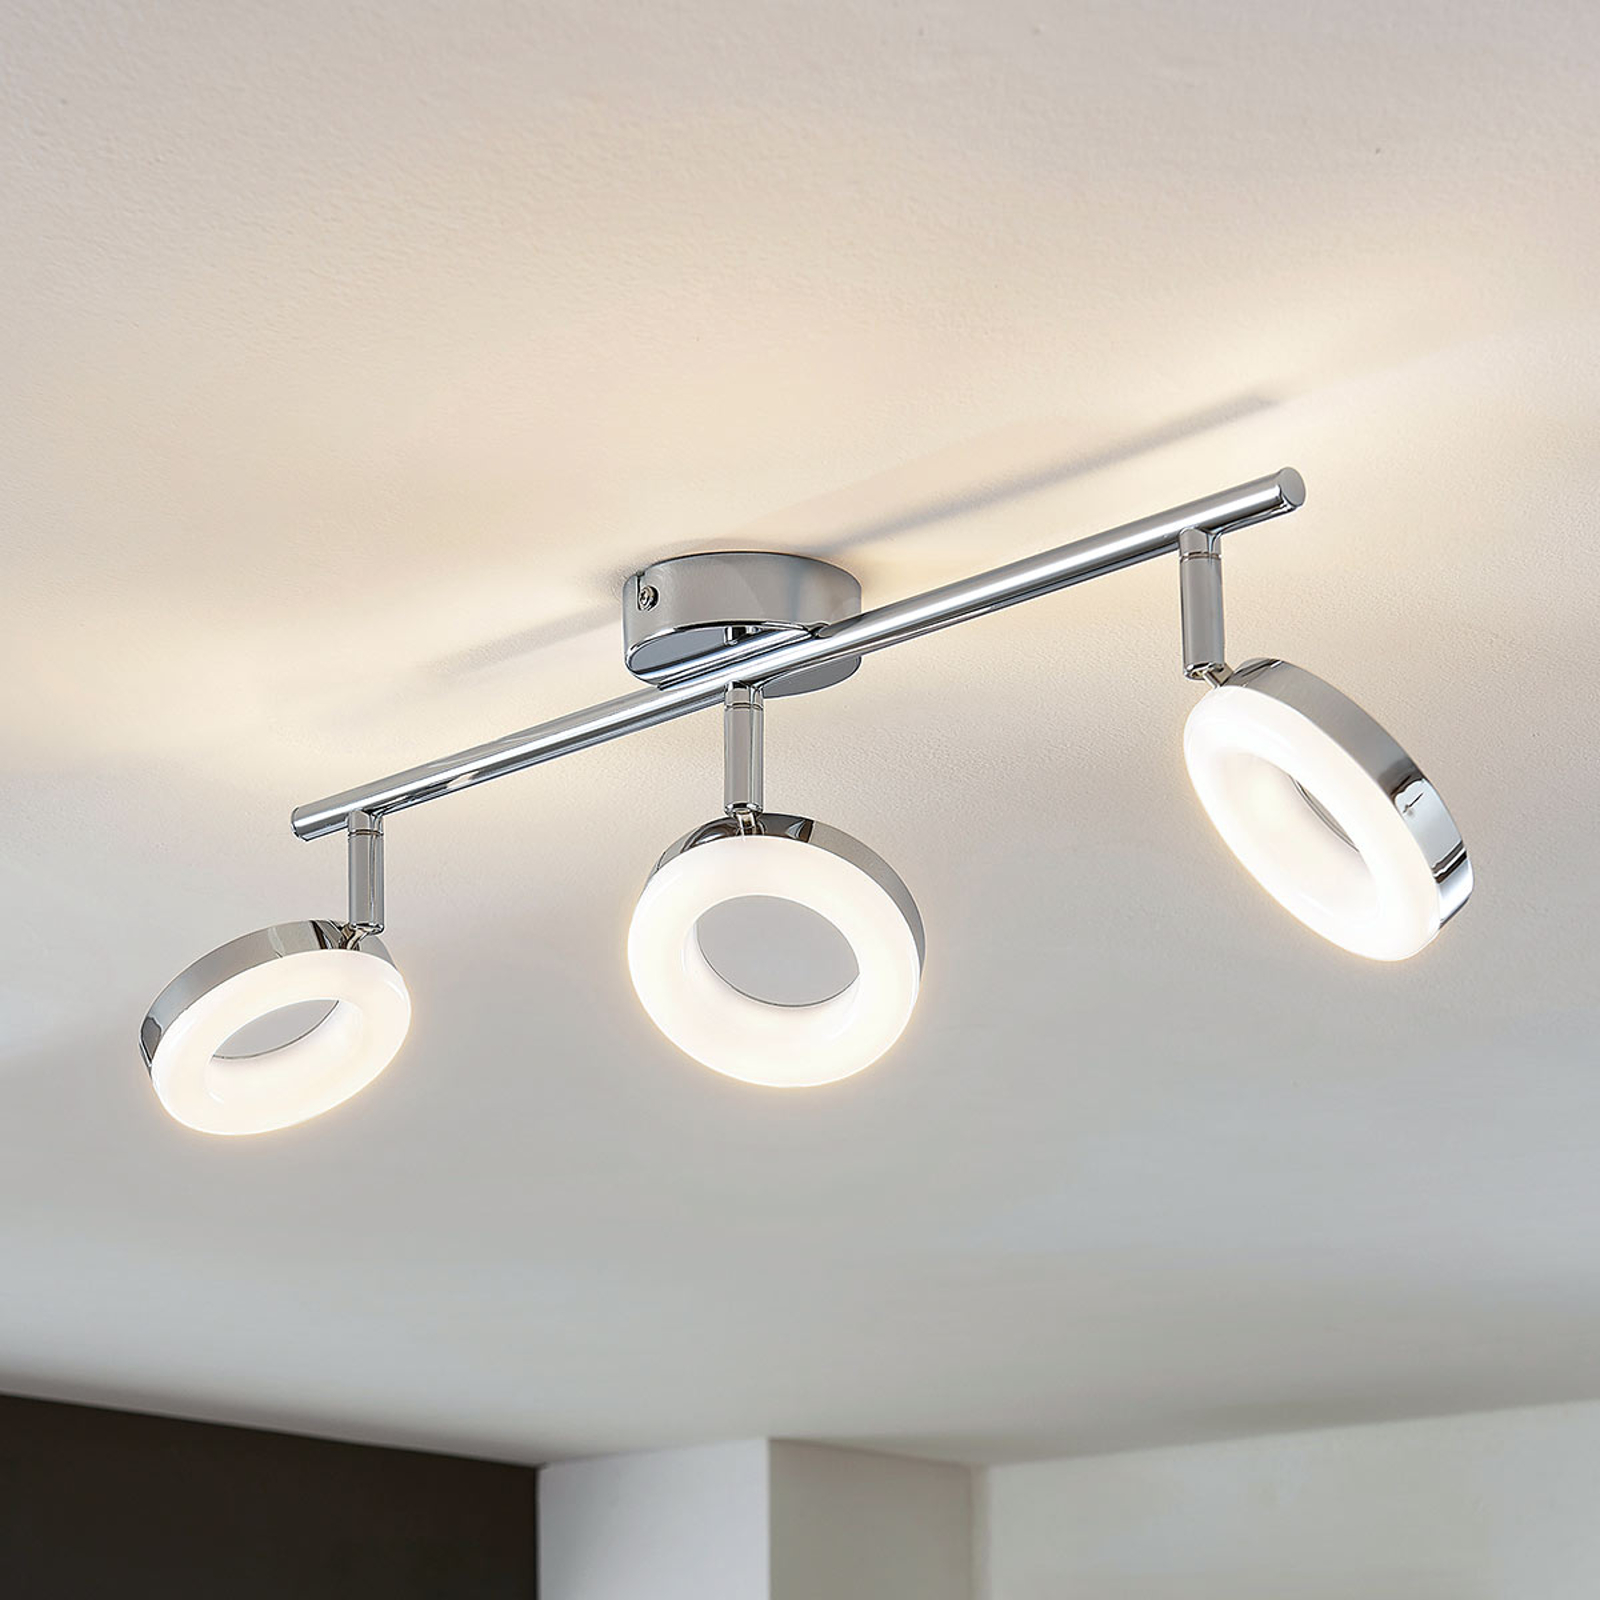 LED-Deckenleuchte Ringo 3-flammig lang